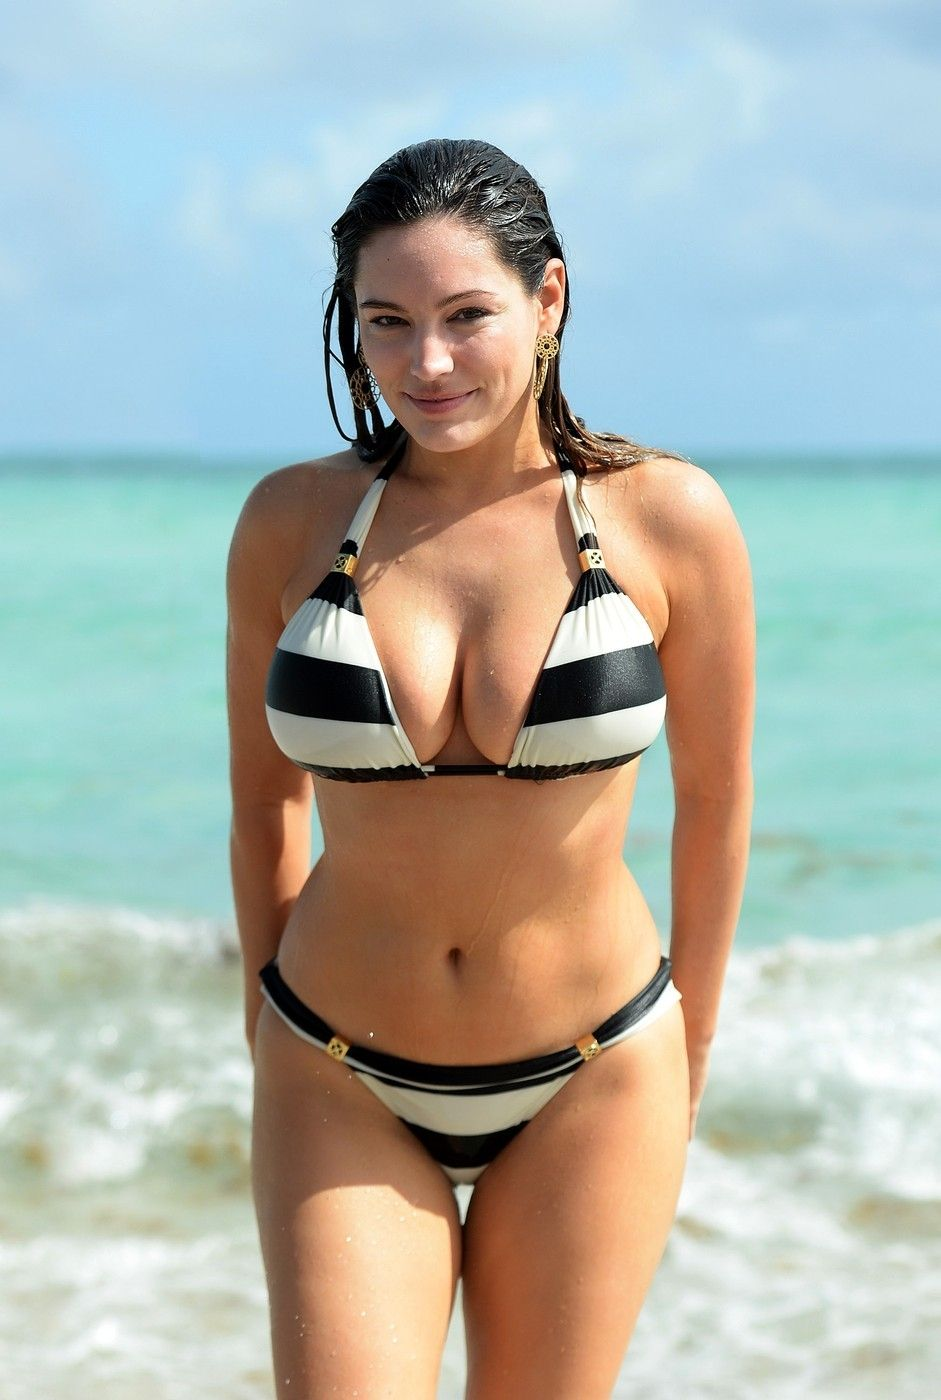 a392a1f5fe Charming Bikini Girls. Daily Pics. Sunny Beaches & Stylish Swimwear. Are  You Ready for the Summer?